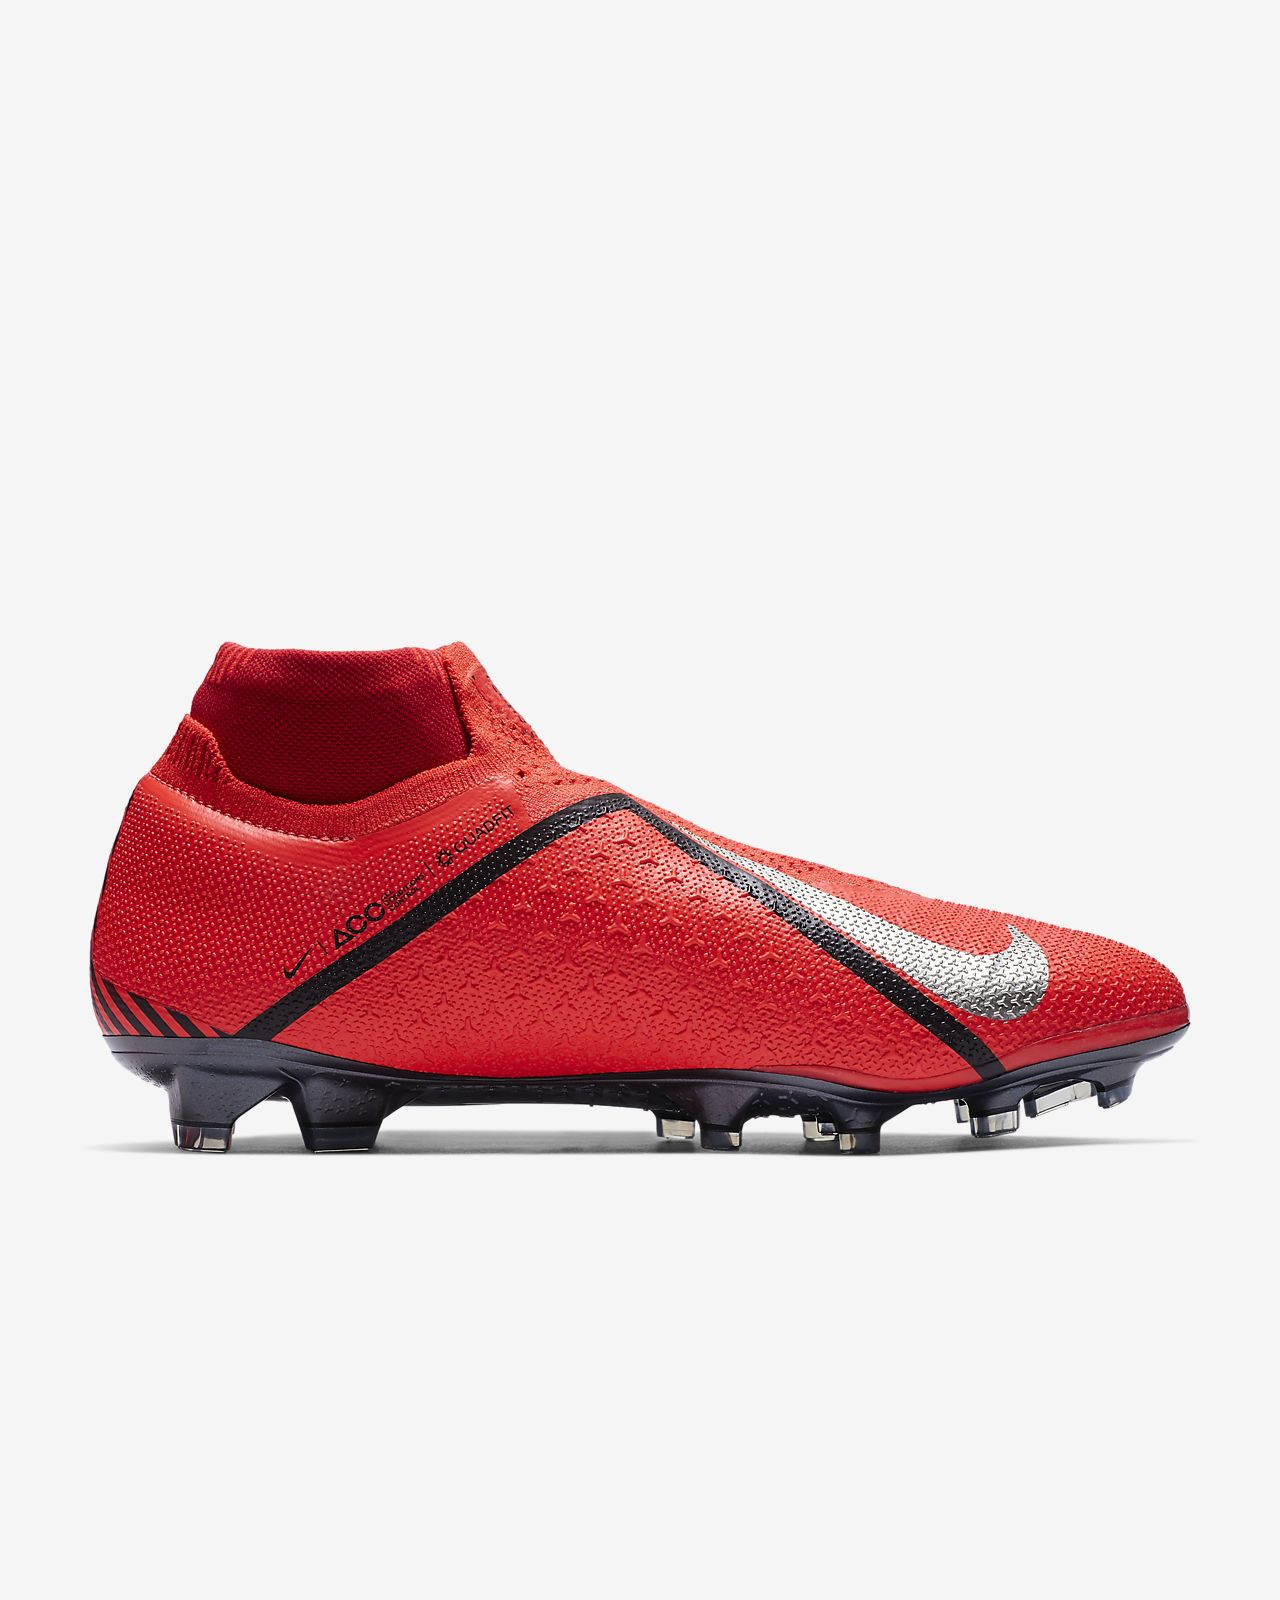 Nike PhantomVSN Elite Dynamic Fit Game Over FG Firm Ground Football Boot